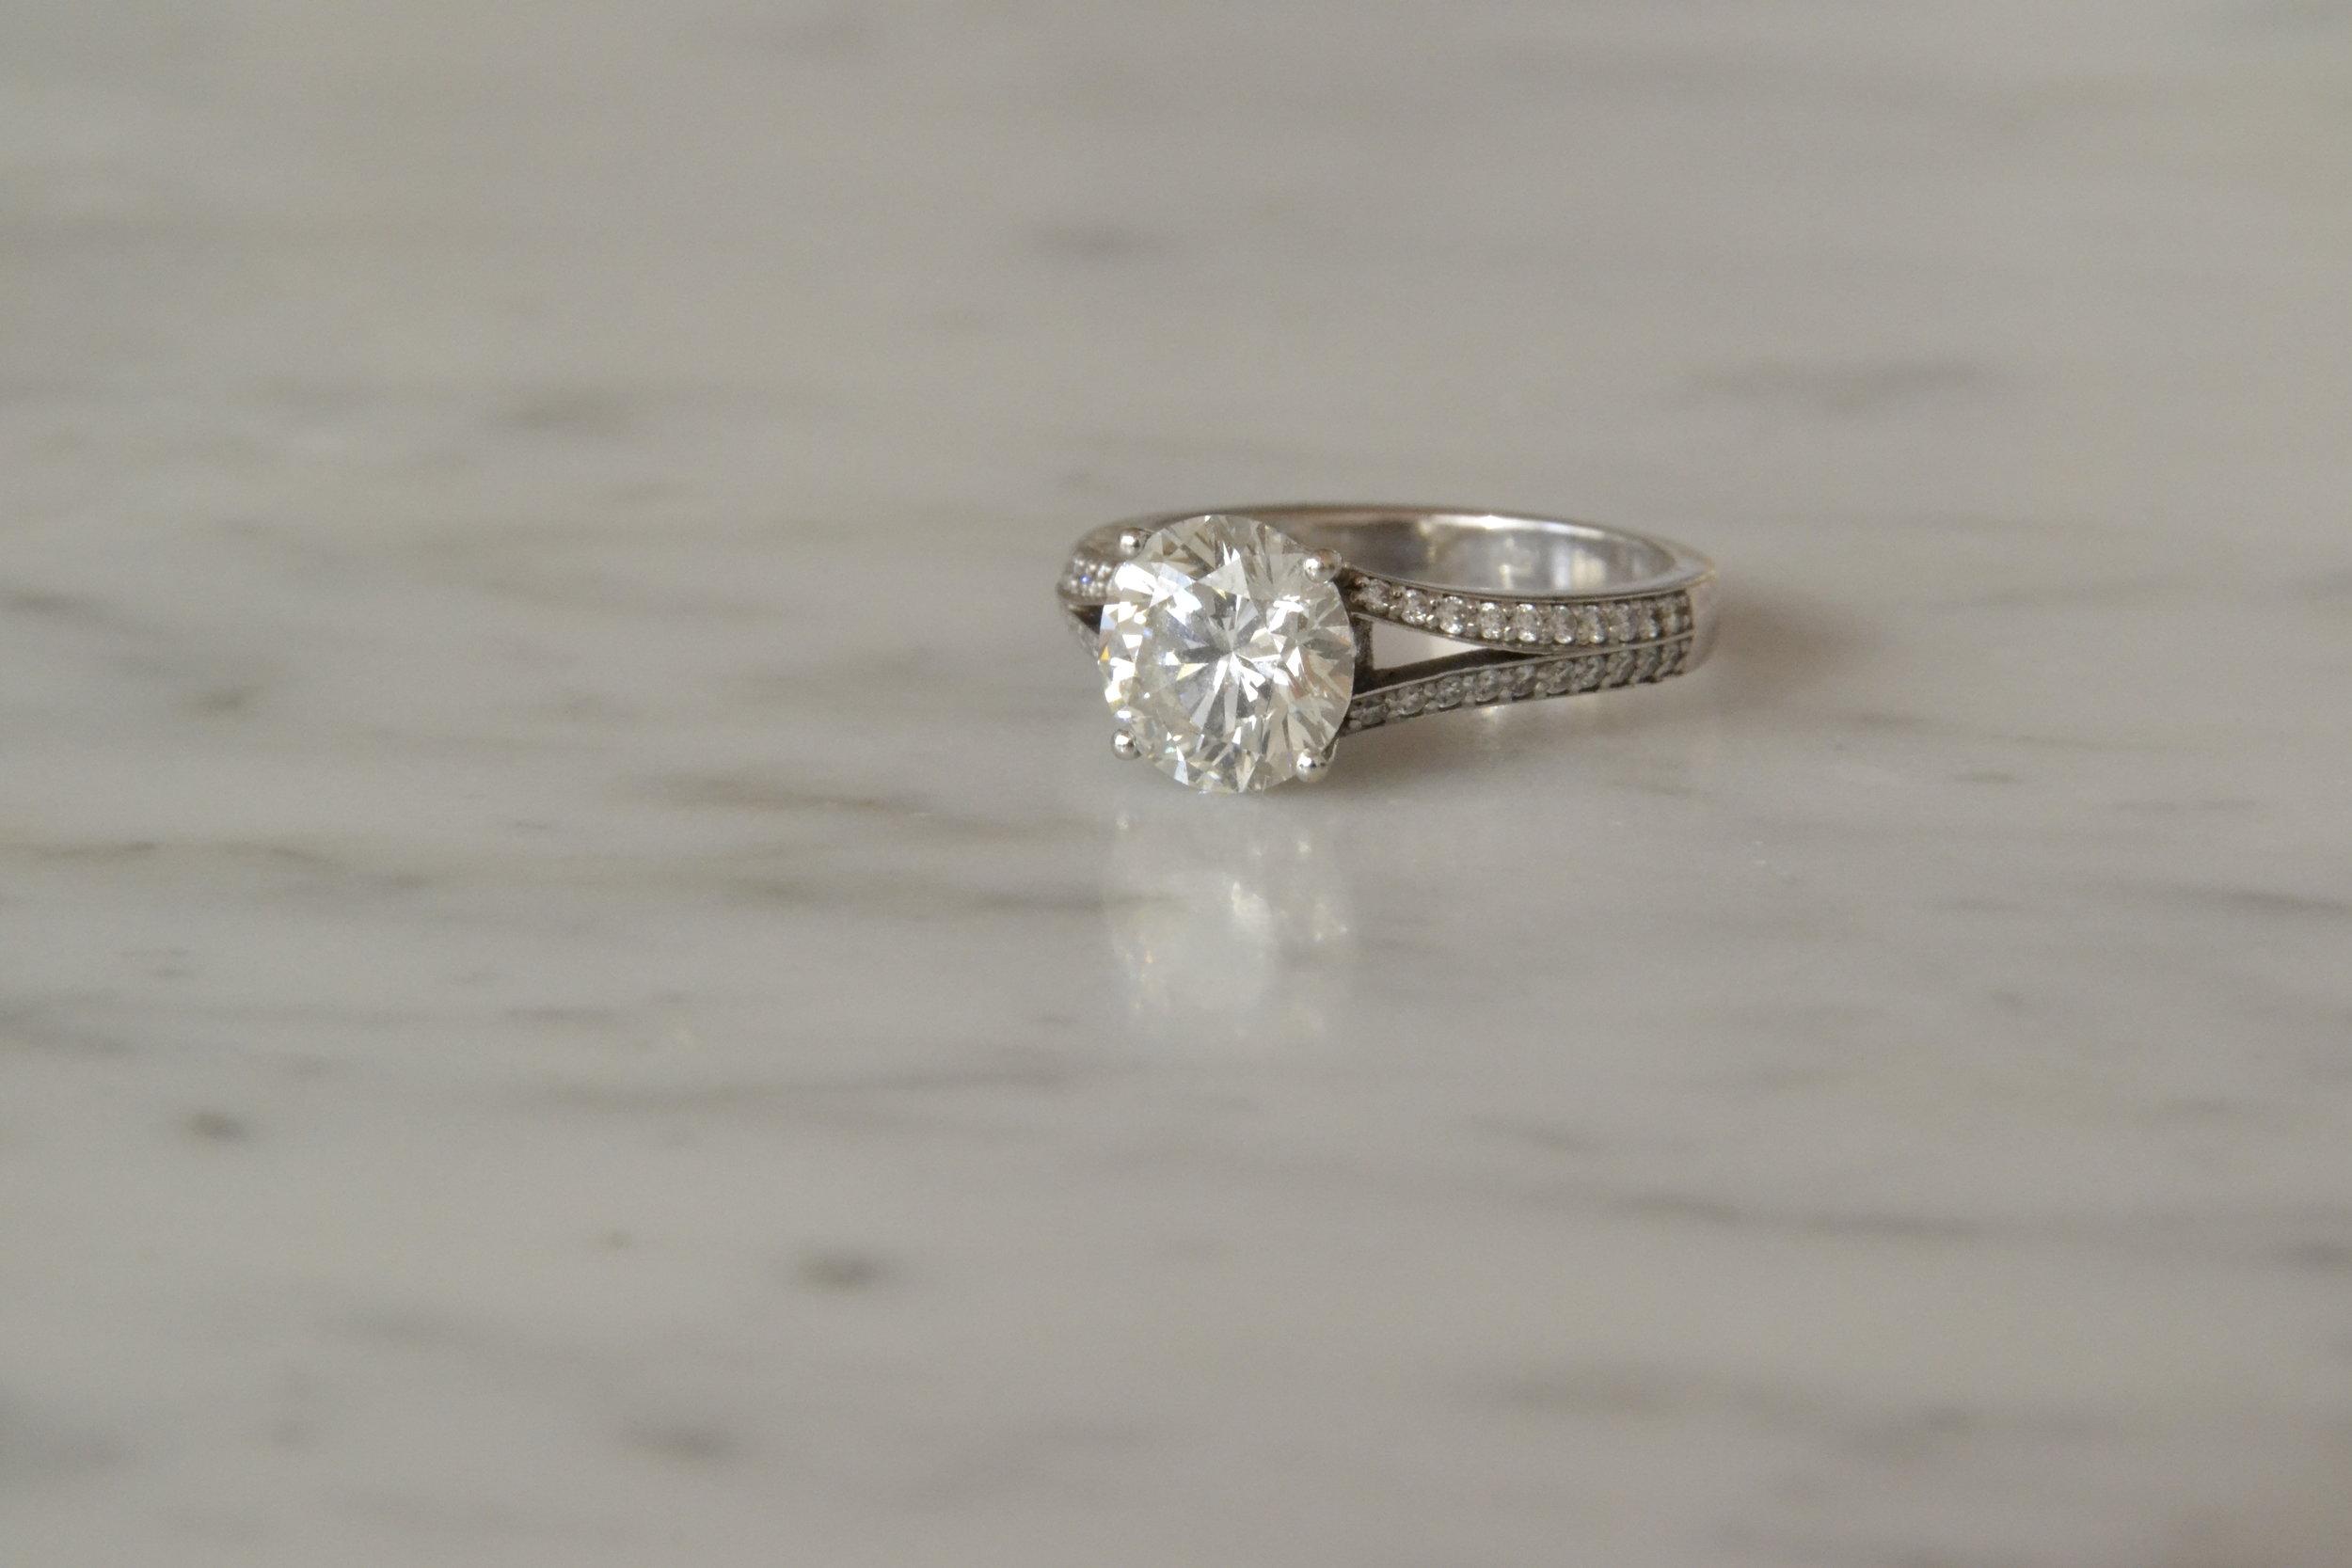 2.1 carat brilliant cut diamond set in white gold